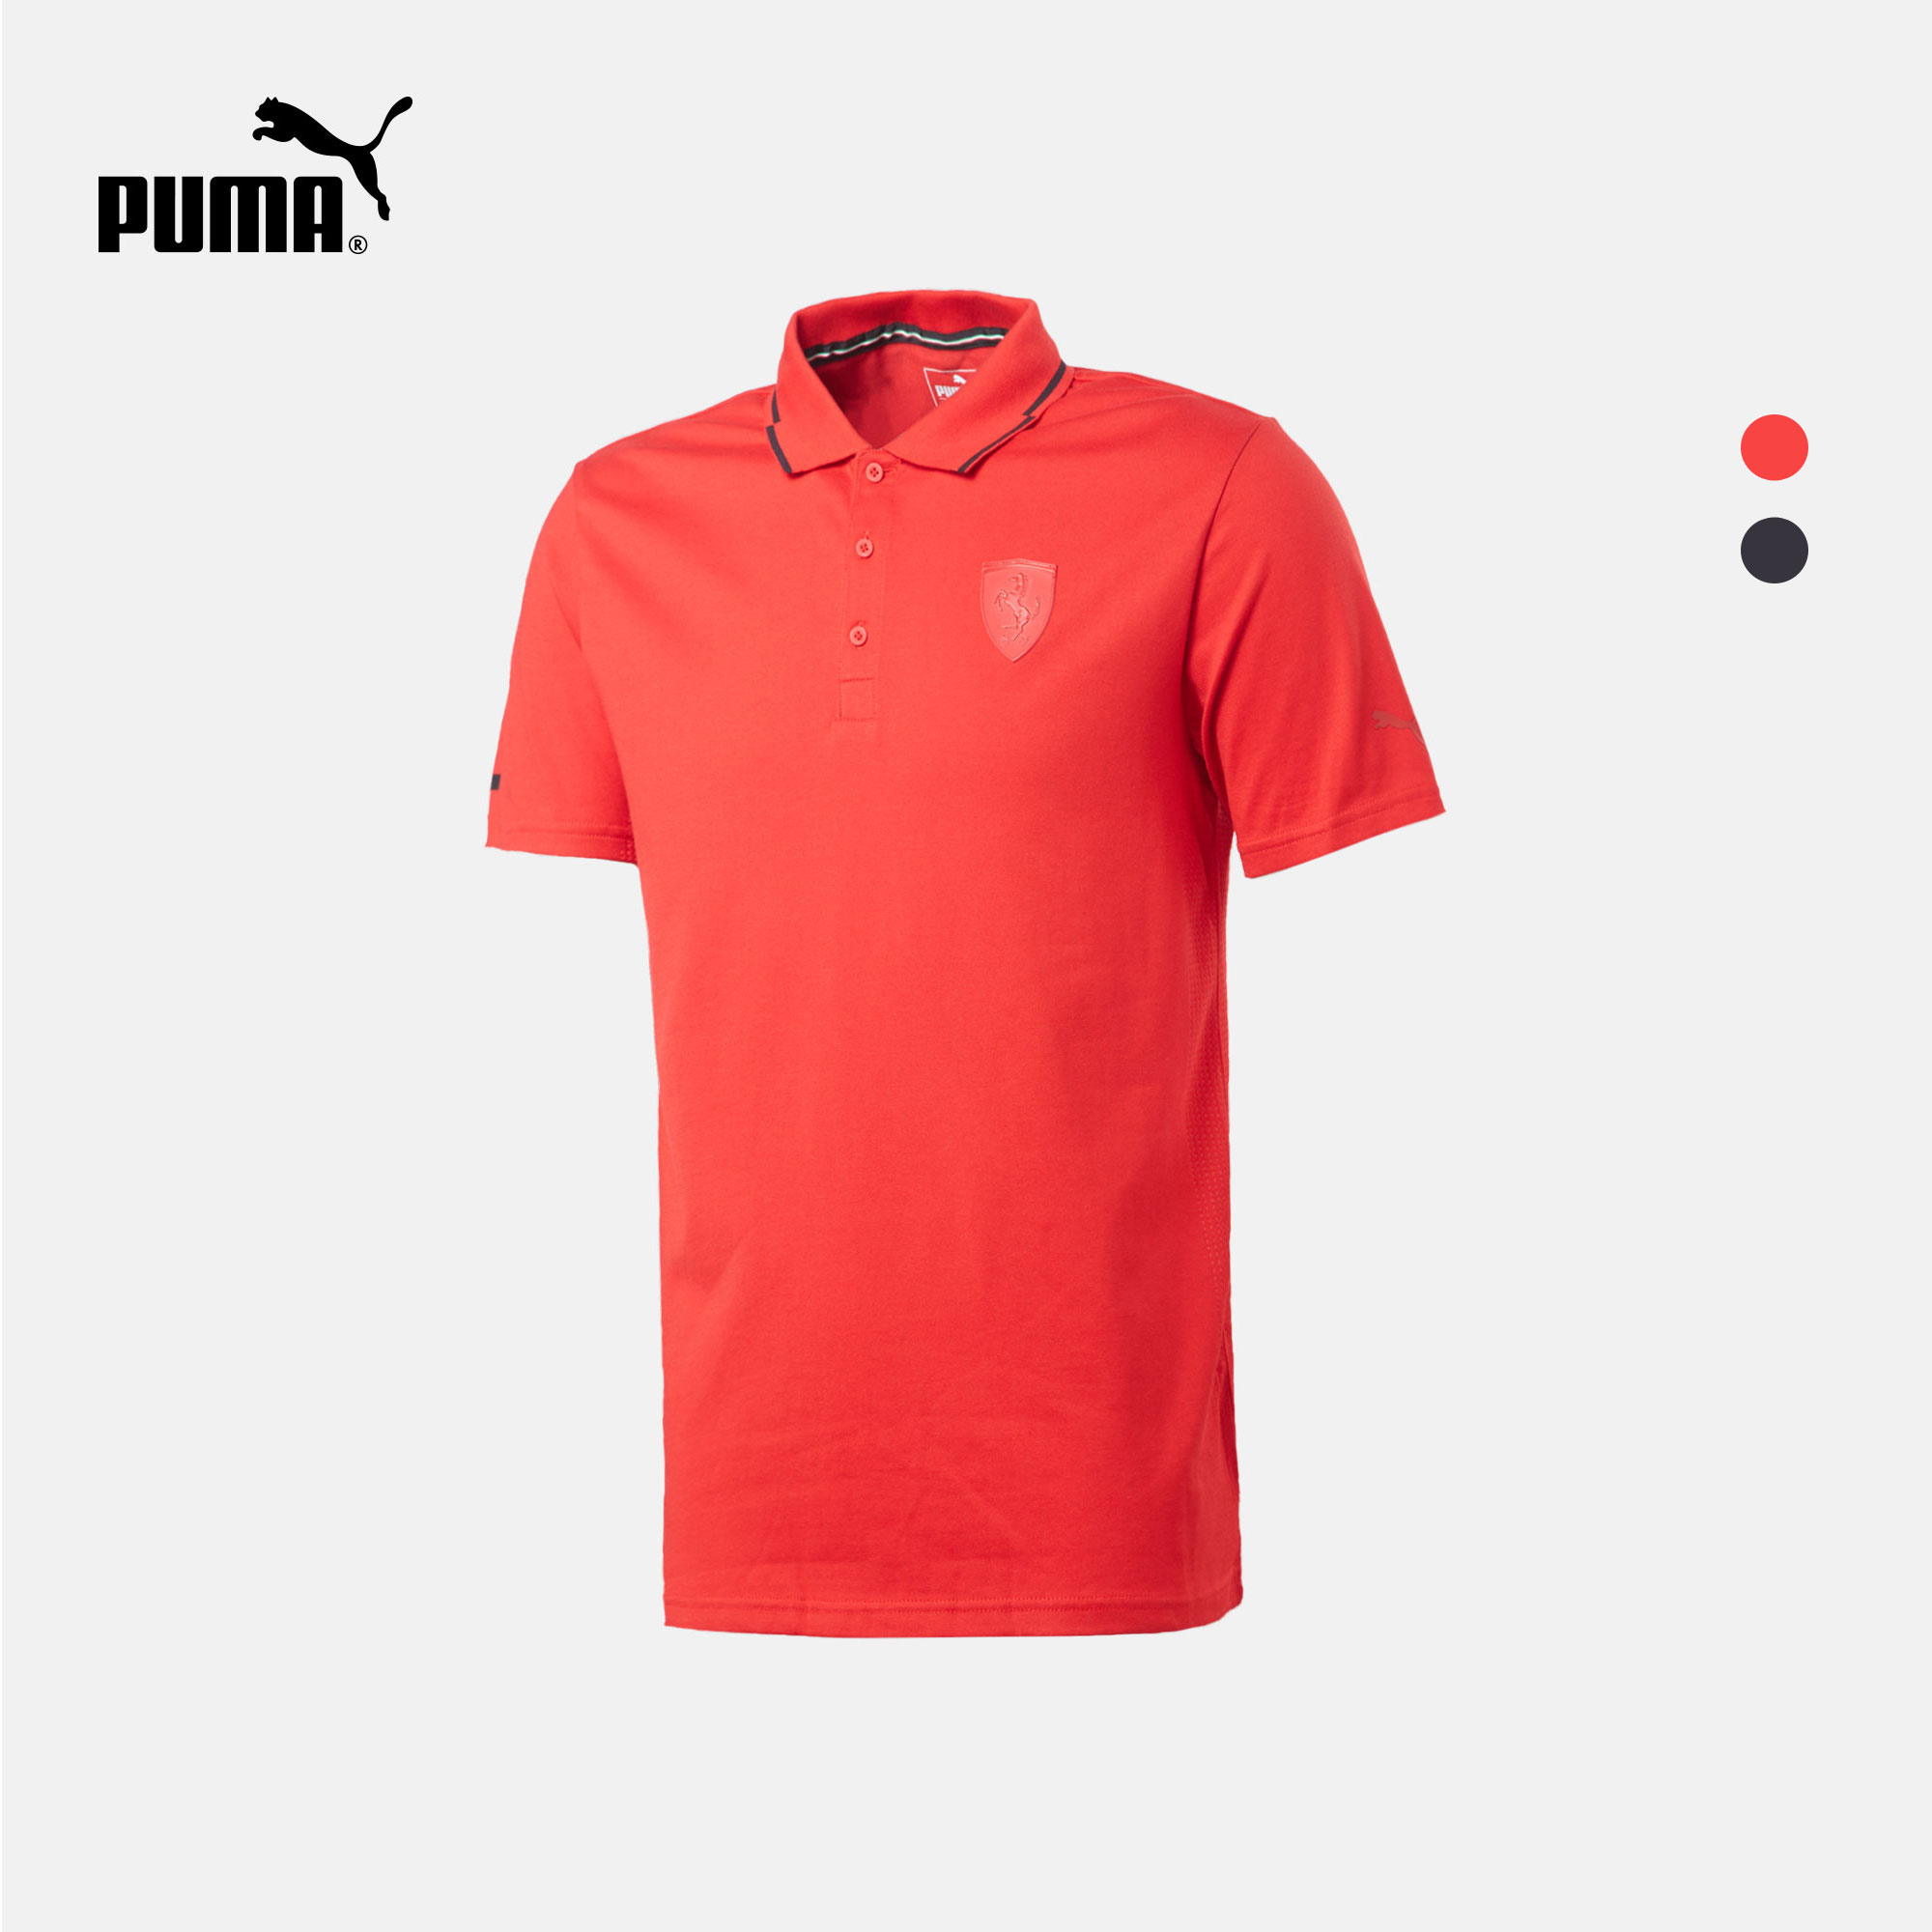 PUMA彪马官方 男子短袖 Polo 衫 PUMA X FERRARI 571204